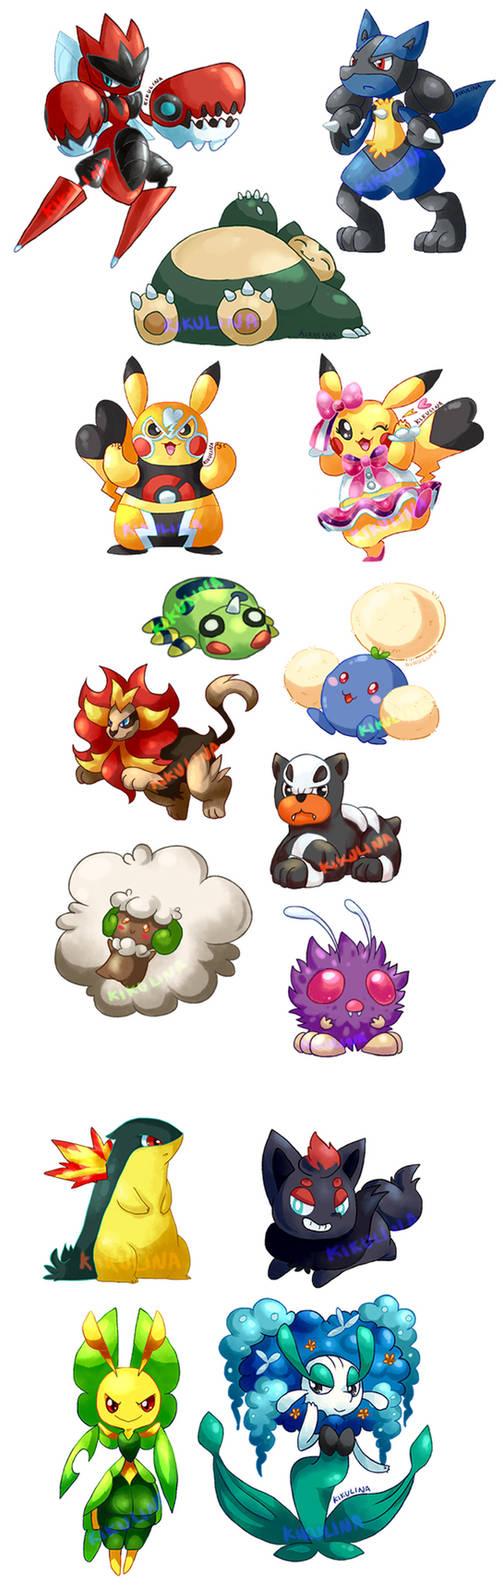 Bunch of Random Pokemon 2